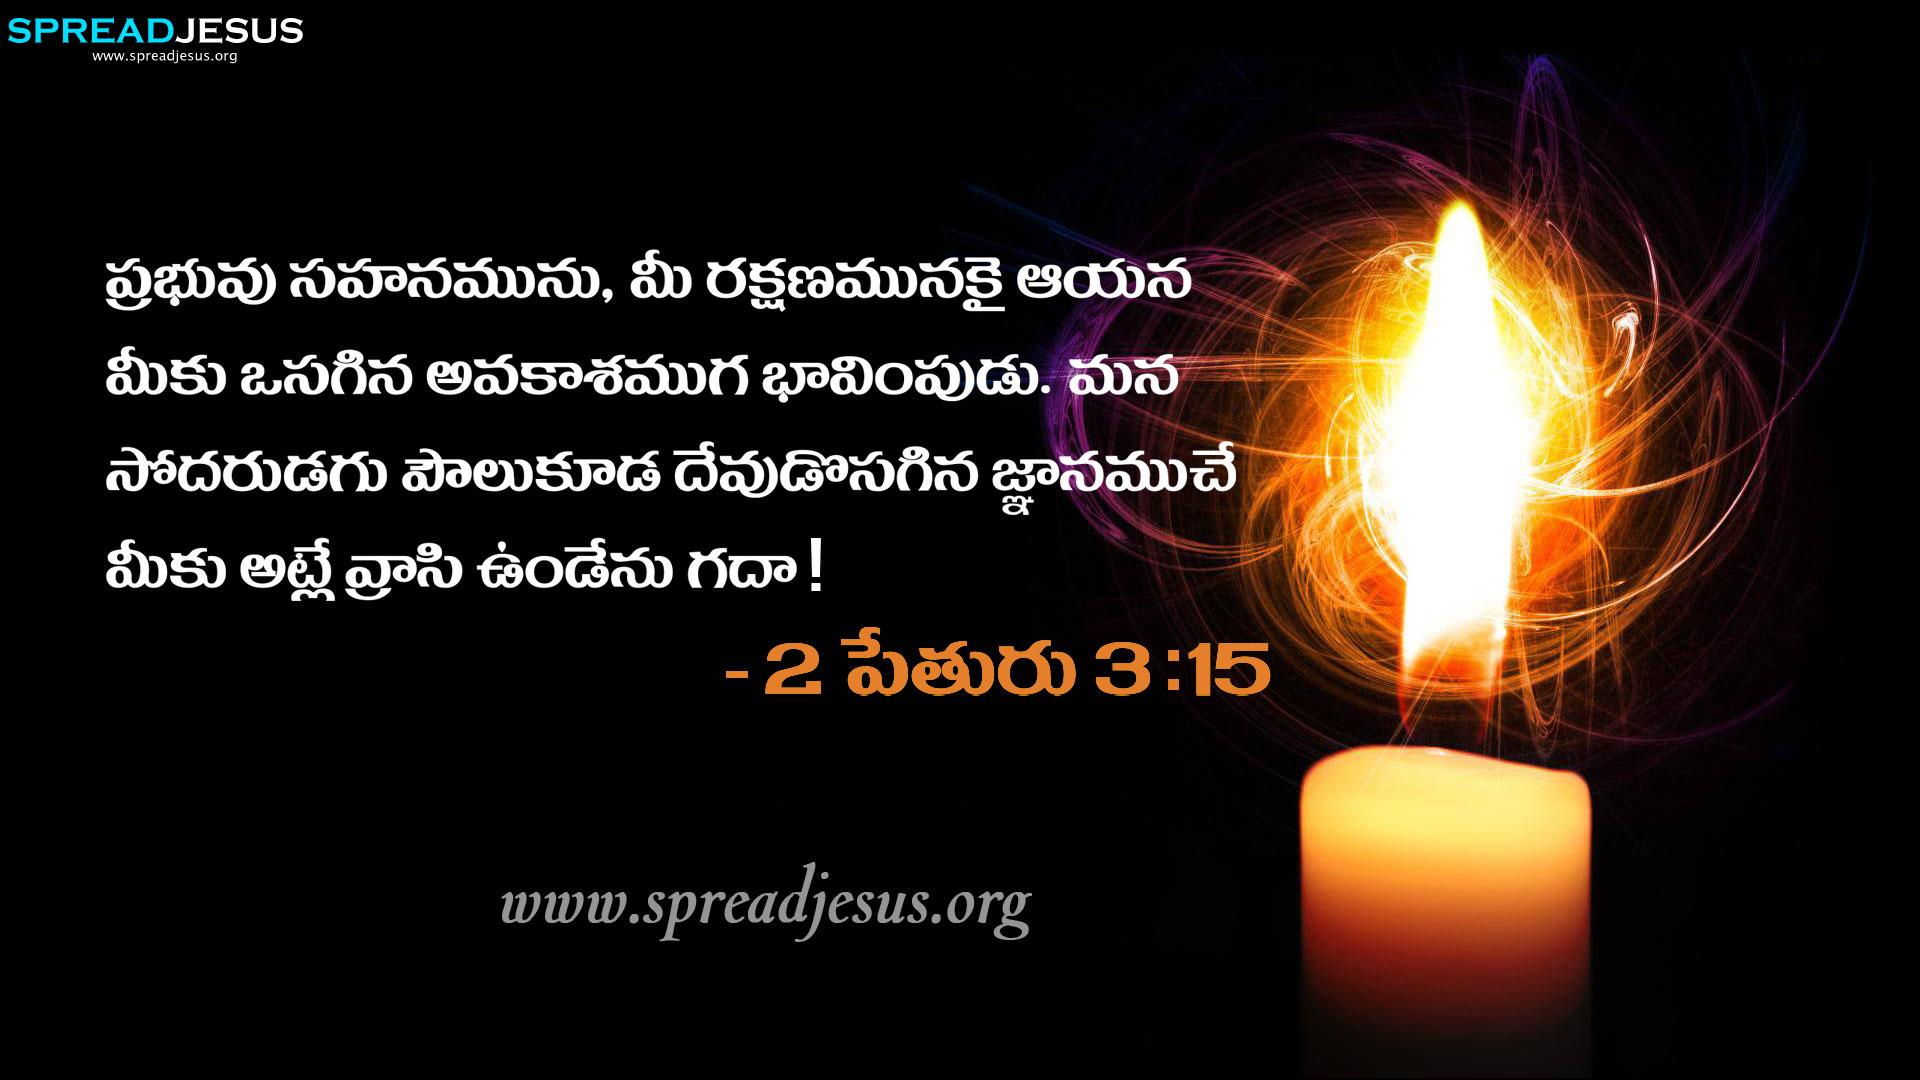 TELUGU BIBLE QUOTES HD-WALLPAPERS 2 PETHURU 3:15 FREE DOWNLOAD